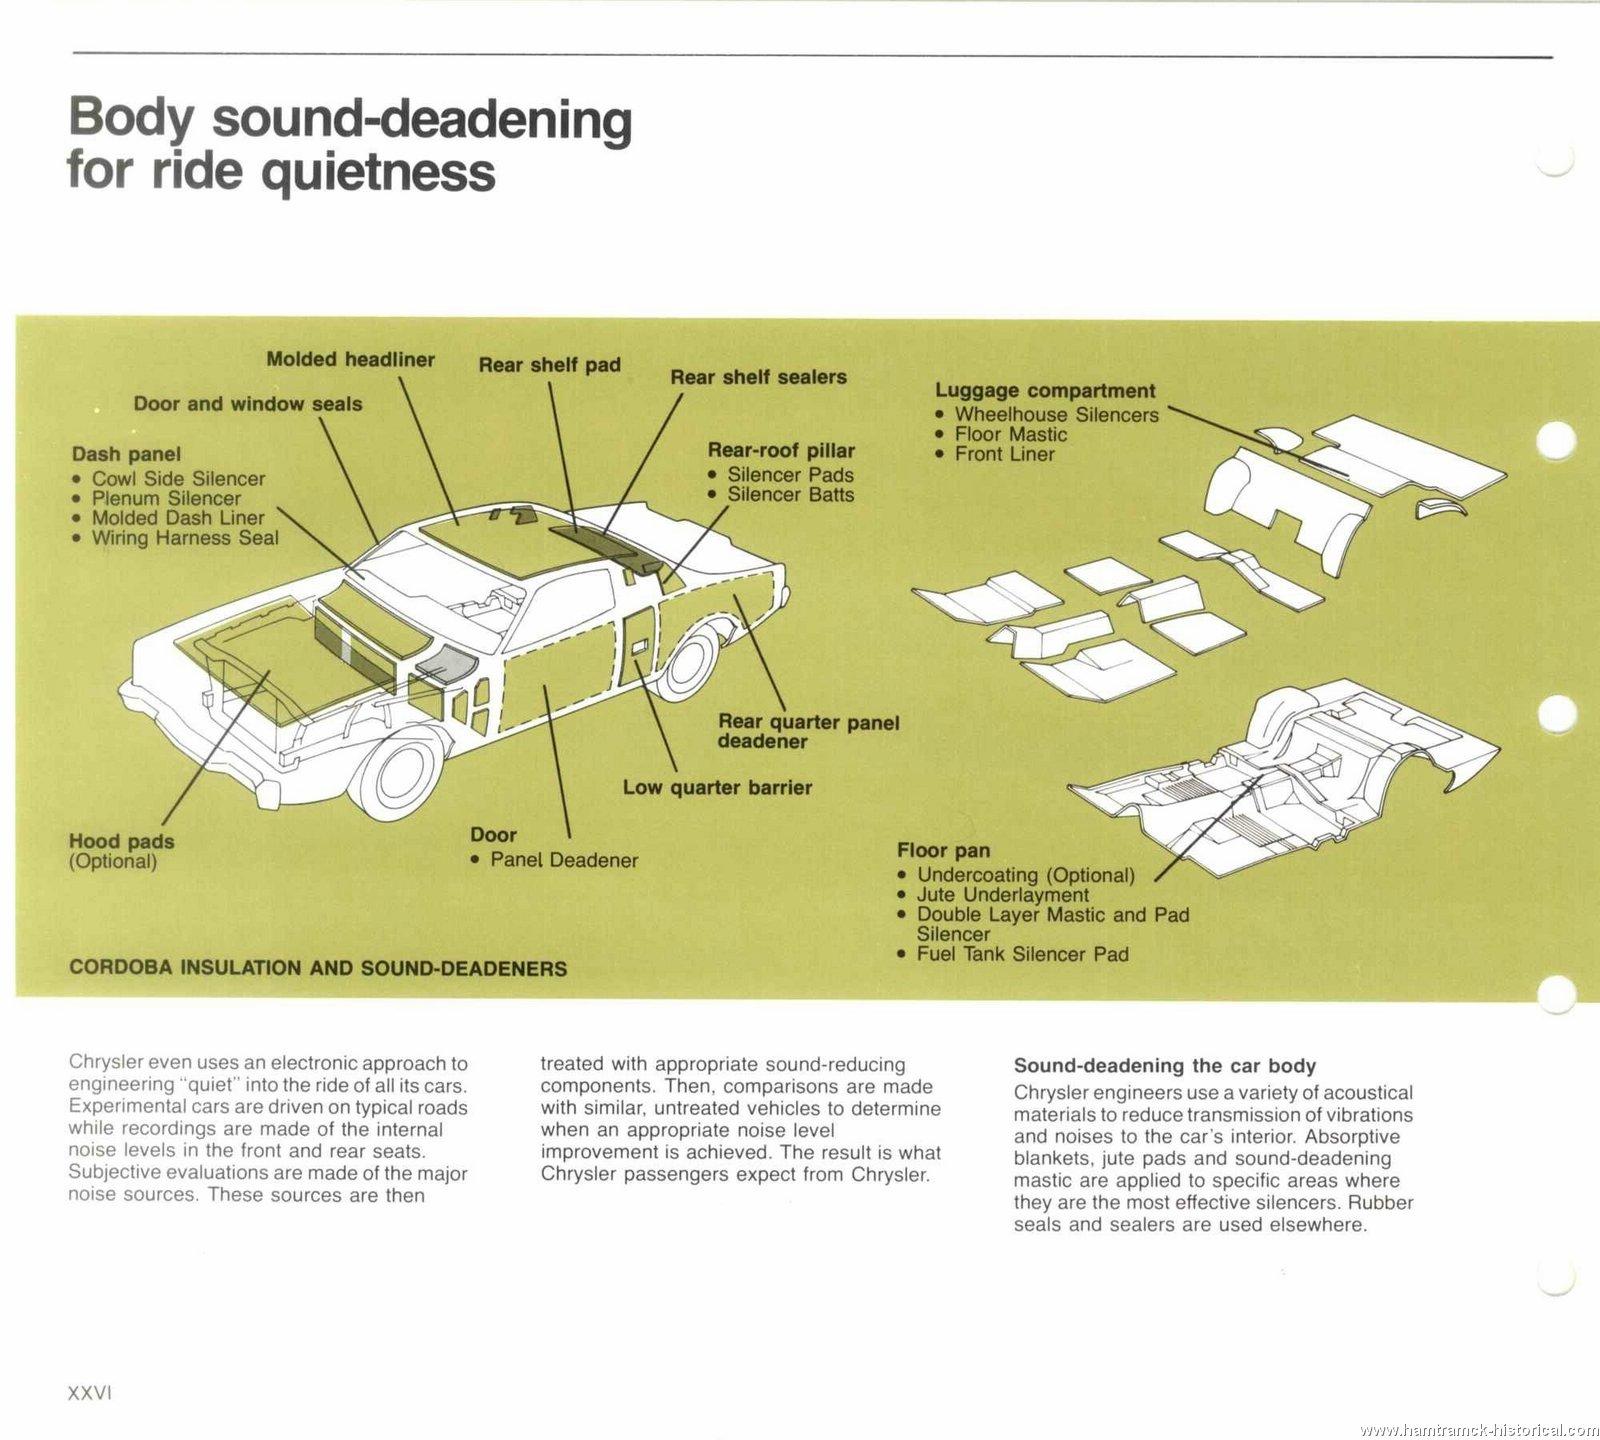 The 1970 Hamtramck Registry 1977 Chrysler Dealership Data Book Cordoba Wiring Diagram Image 77 Engineering 0024